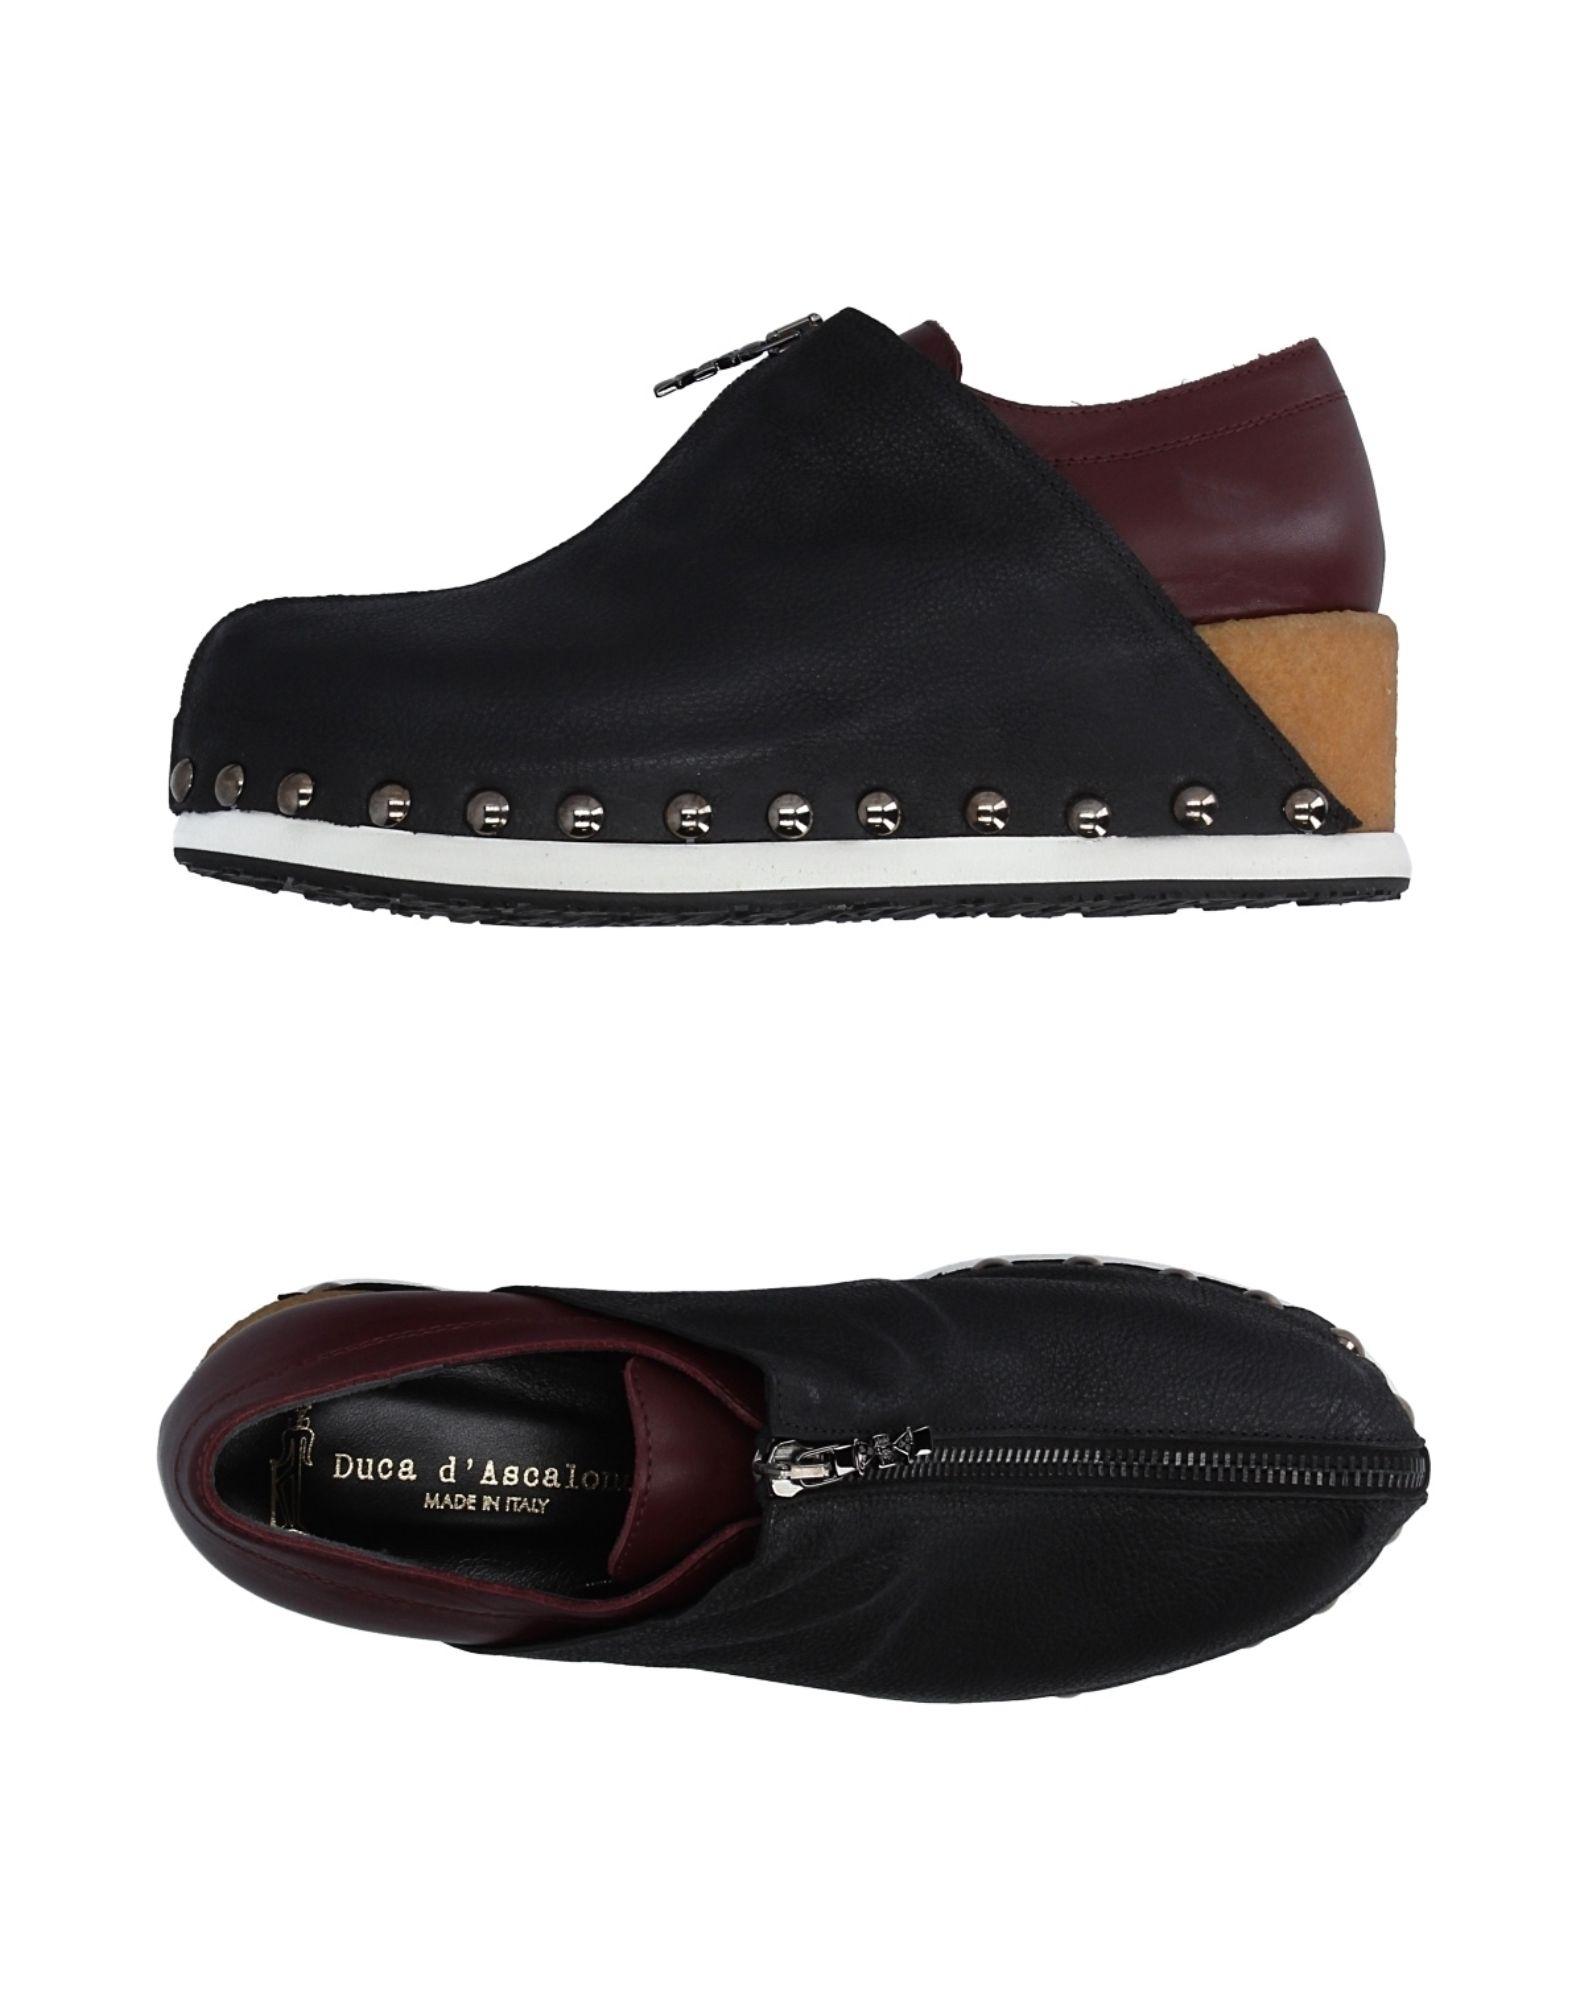 Stilvolle D'ascalona billige Schuhe Duca D'ascalona Stilvolle Schnürschuhe Damen  11310630UR 813f7c